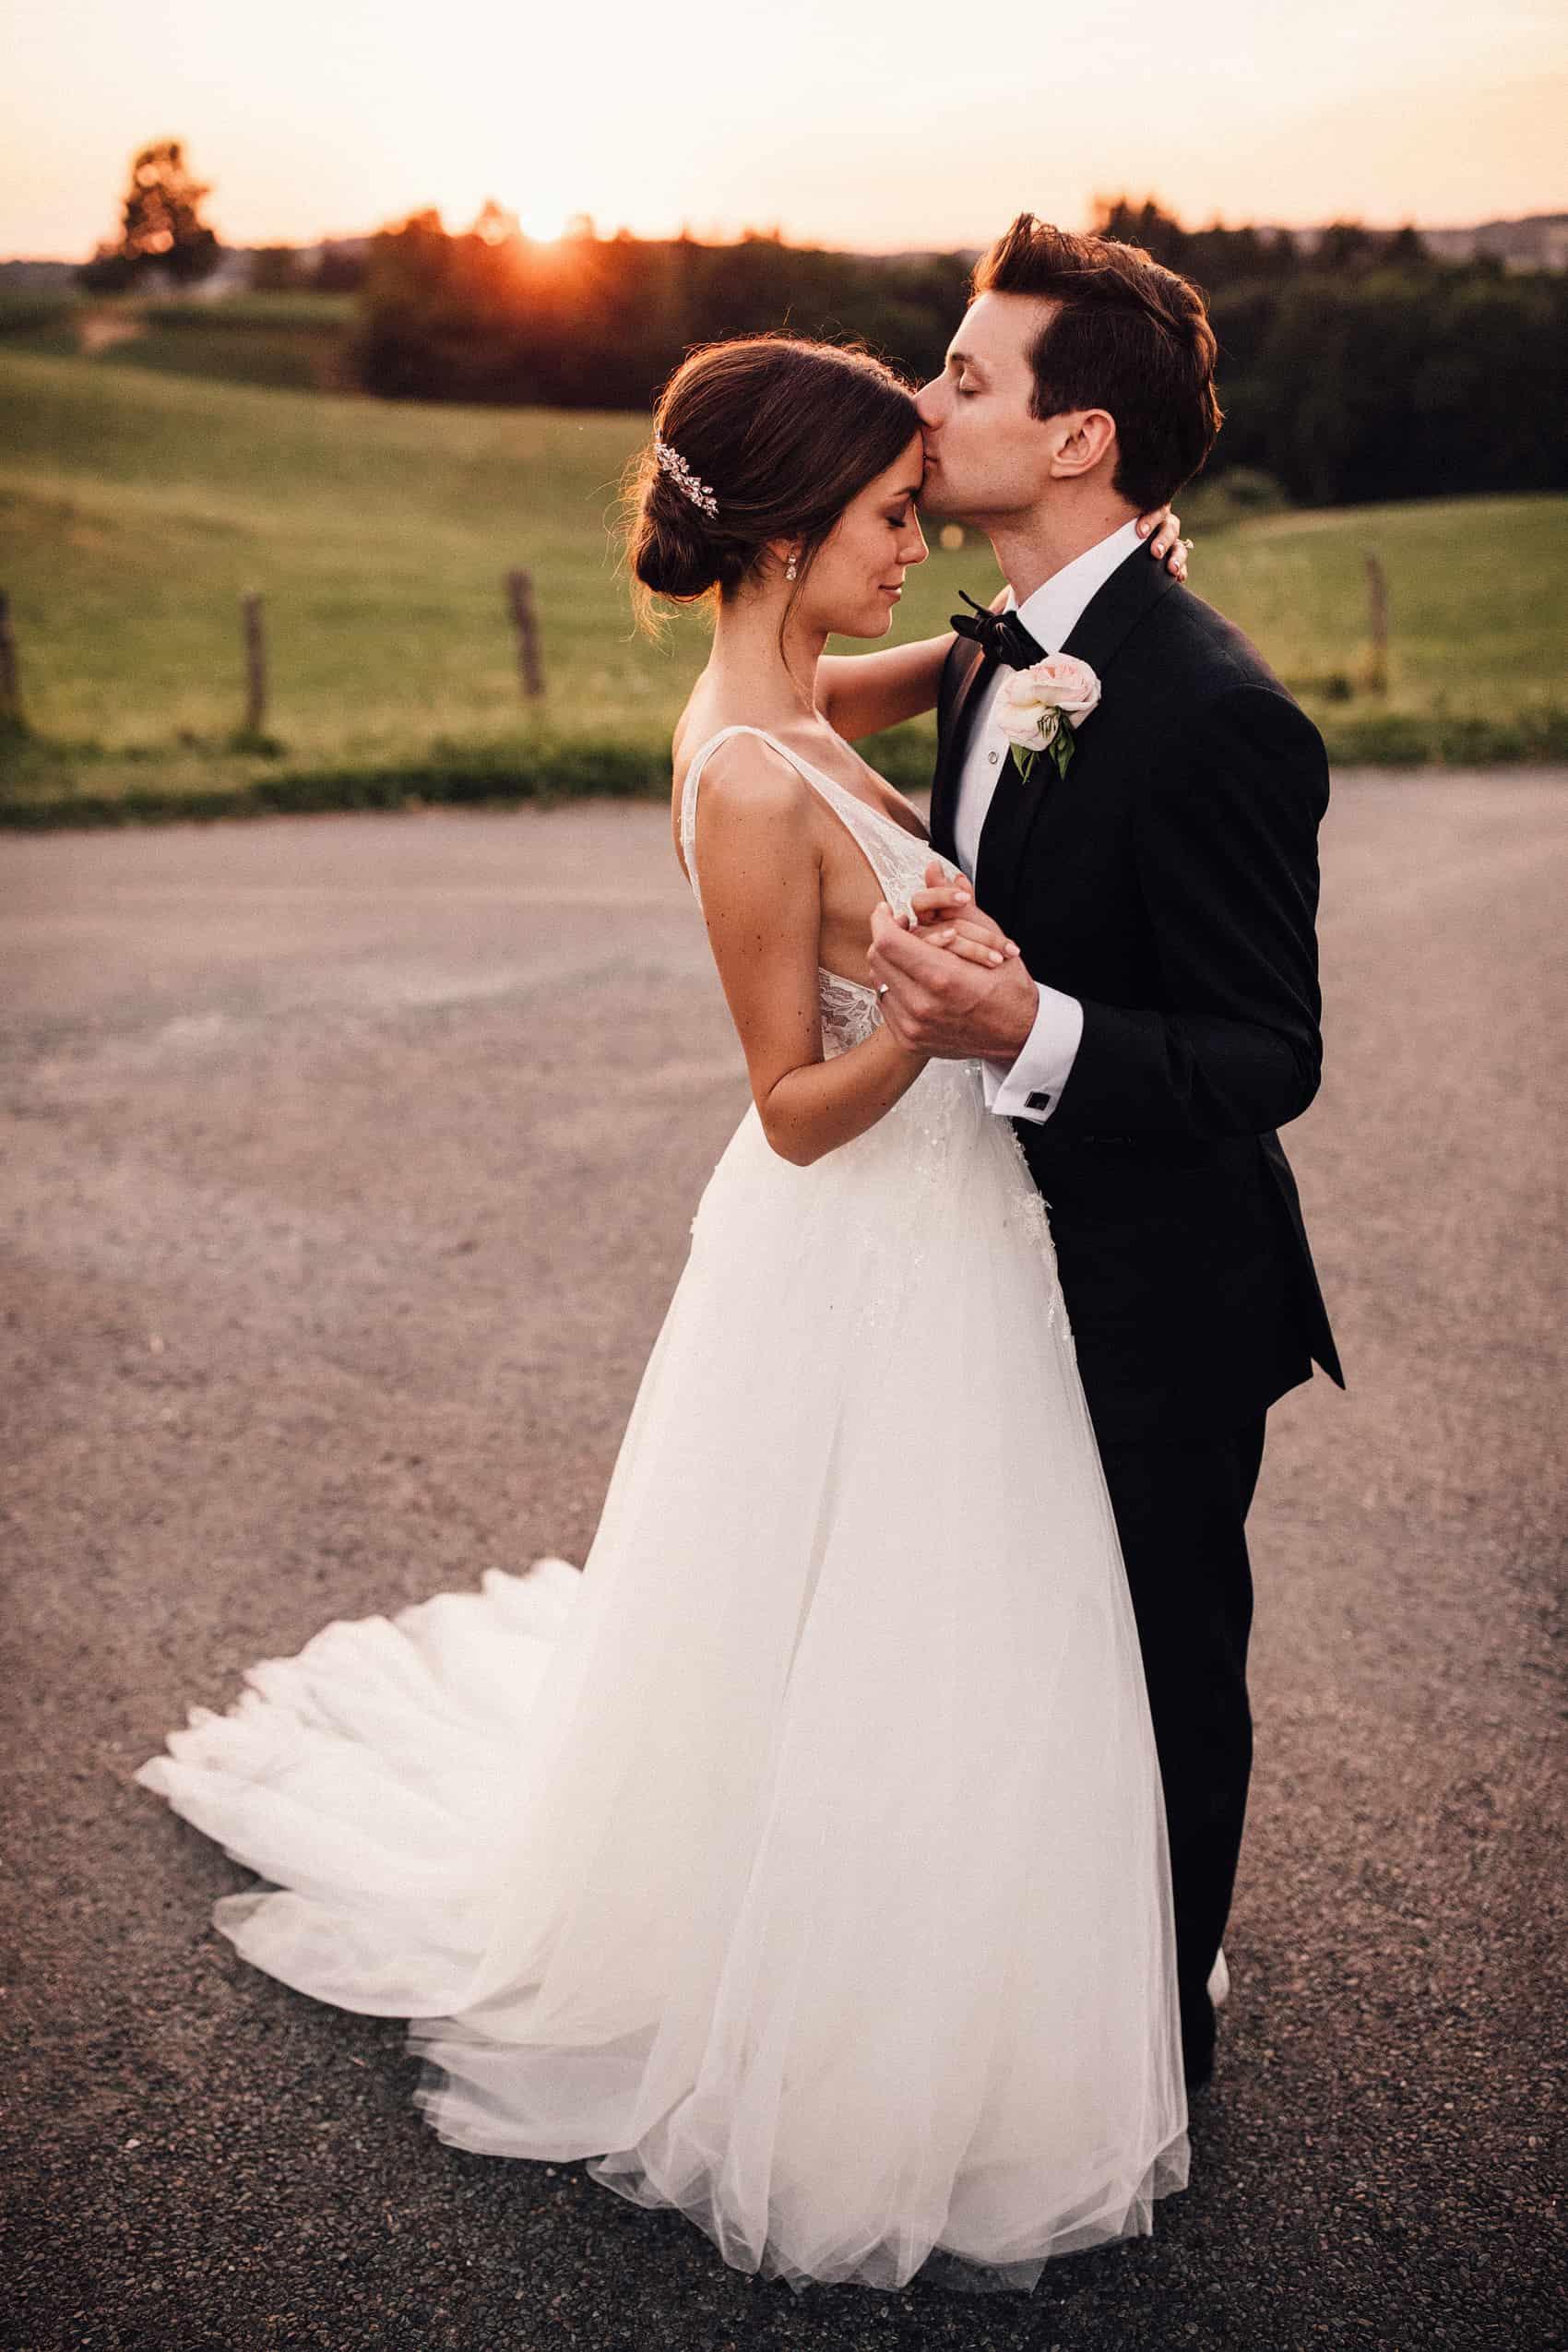 Monique lhuillier wedding dress in France